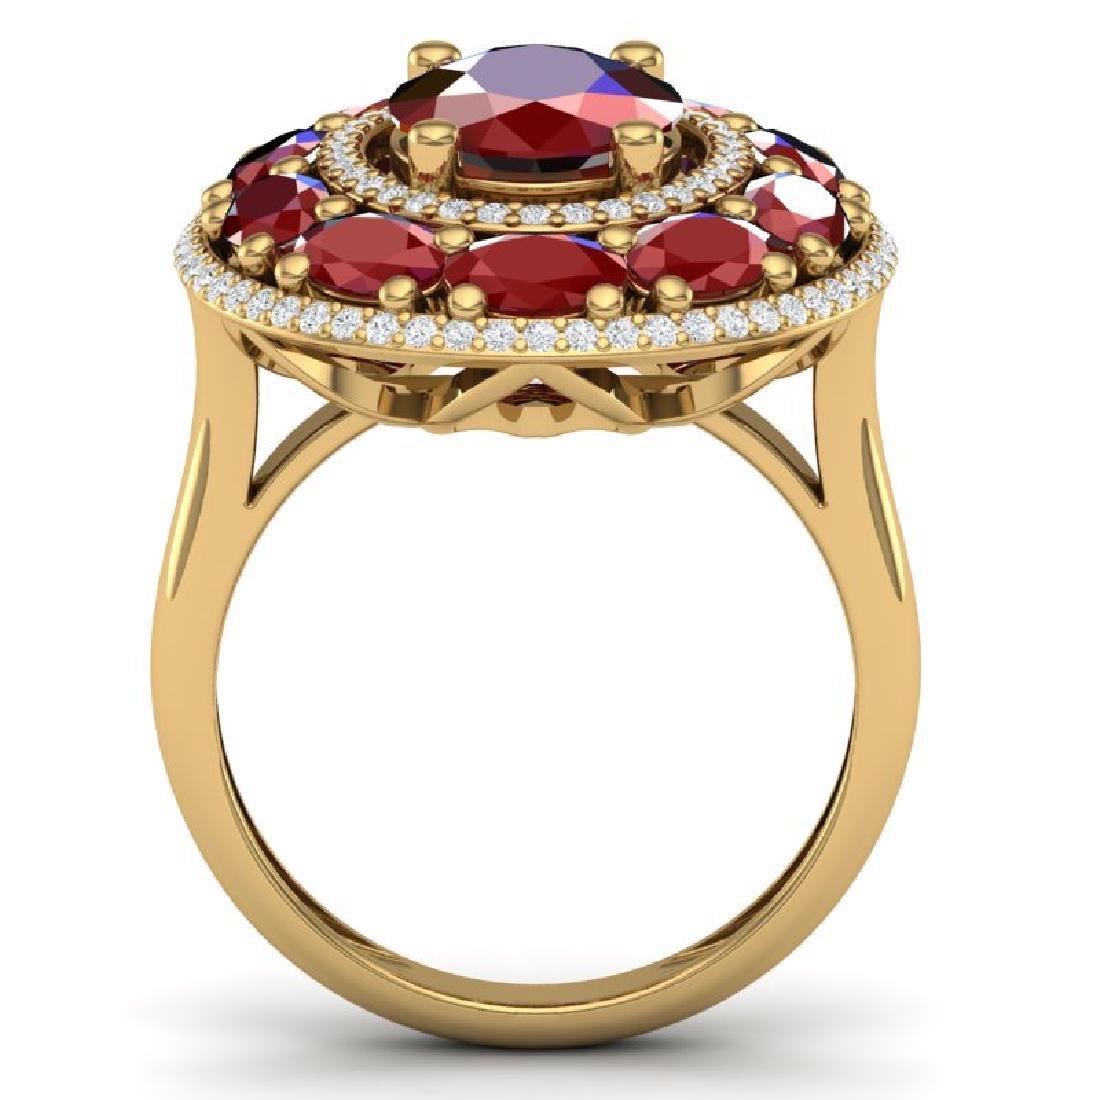 8.05 CTW Royalty Designer Ruby & VS Diamond Ring 18K - 3